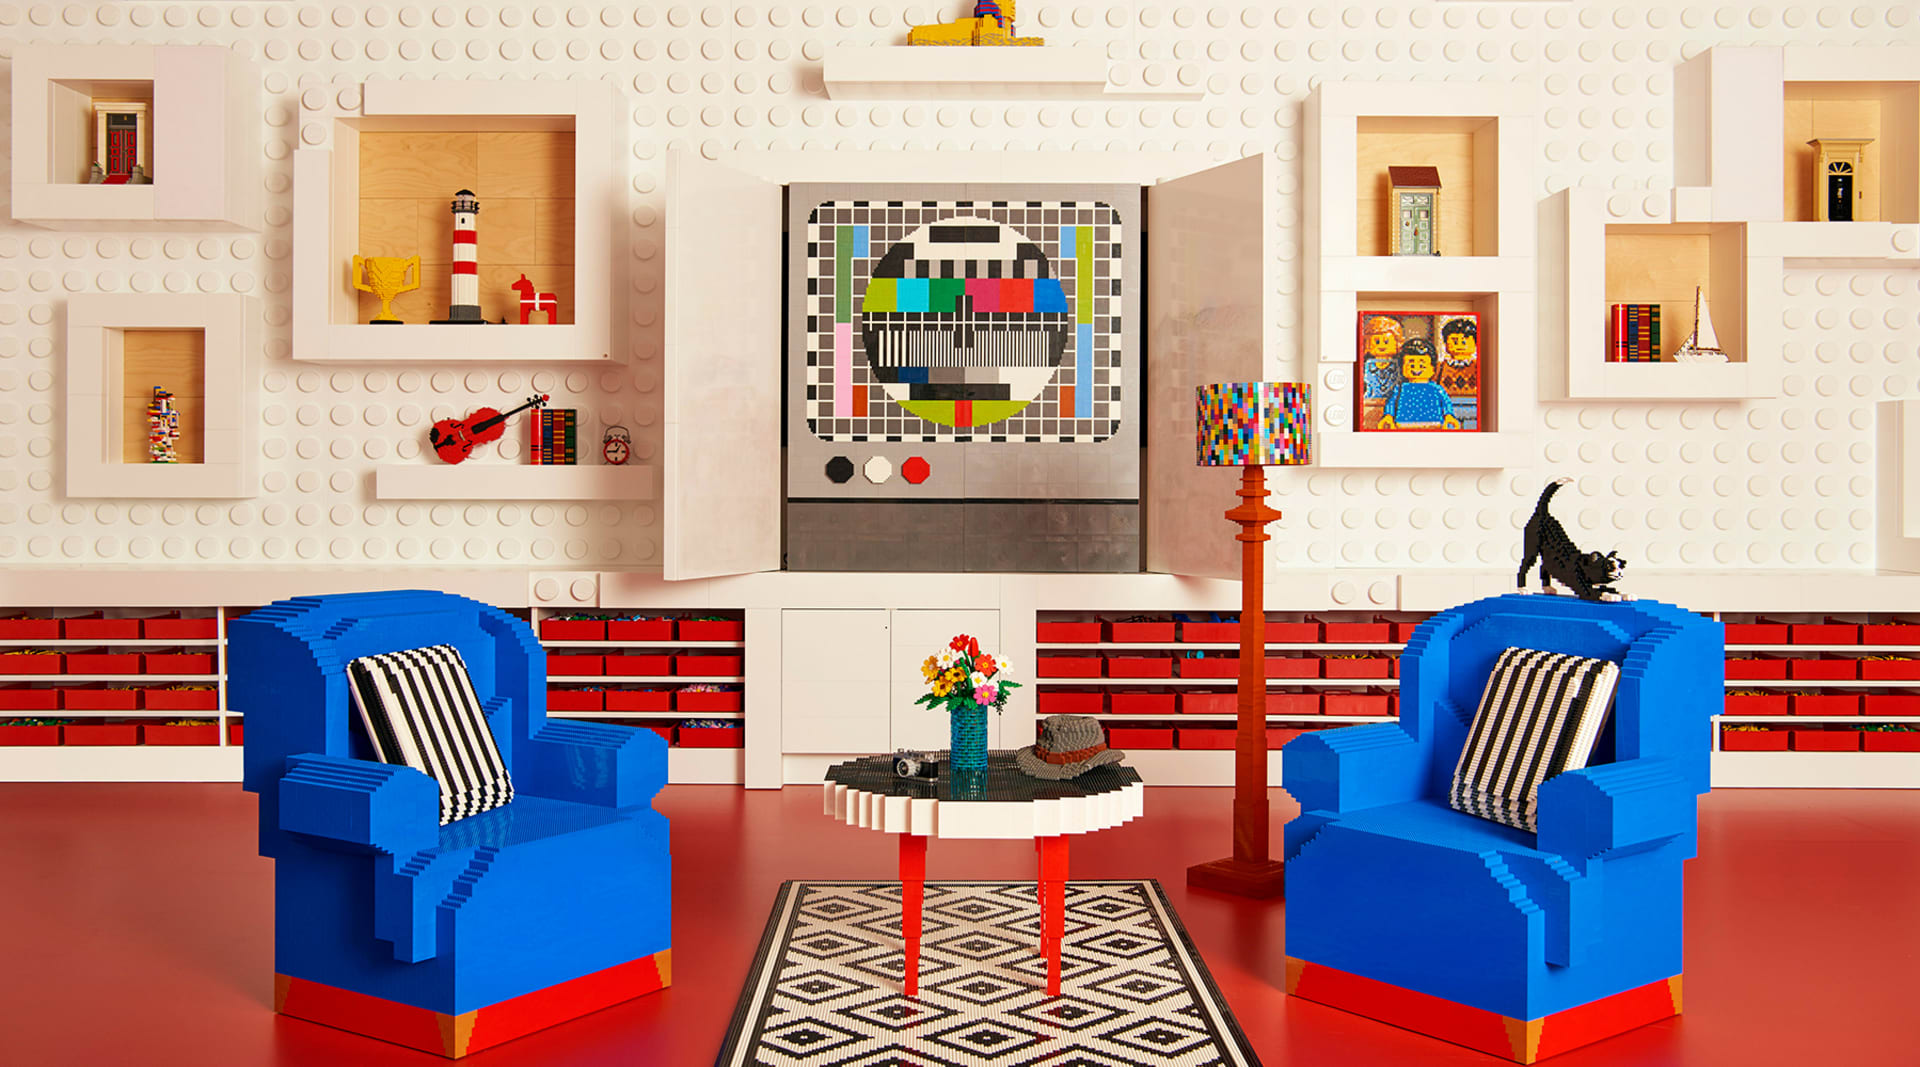 WEB https press atairbnb com app uploads 2017 10 2017 09 07 Air Bn B Lego LIVING 044